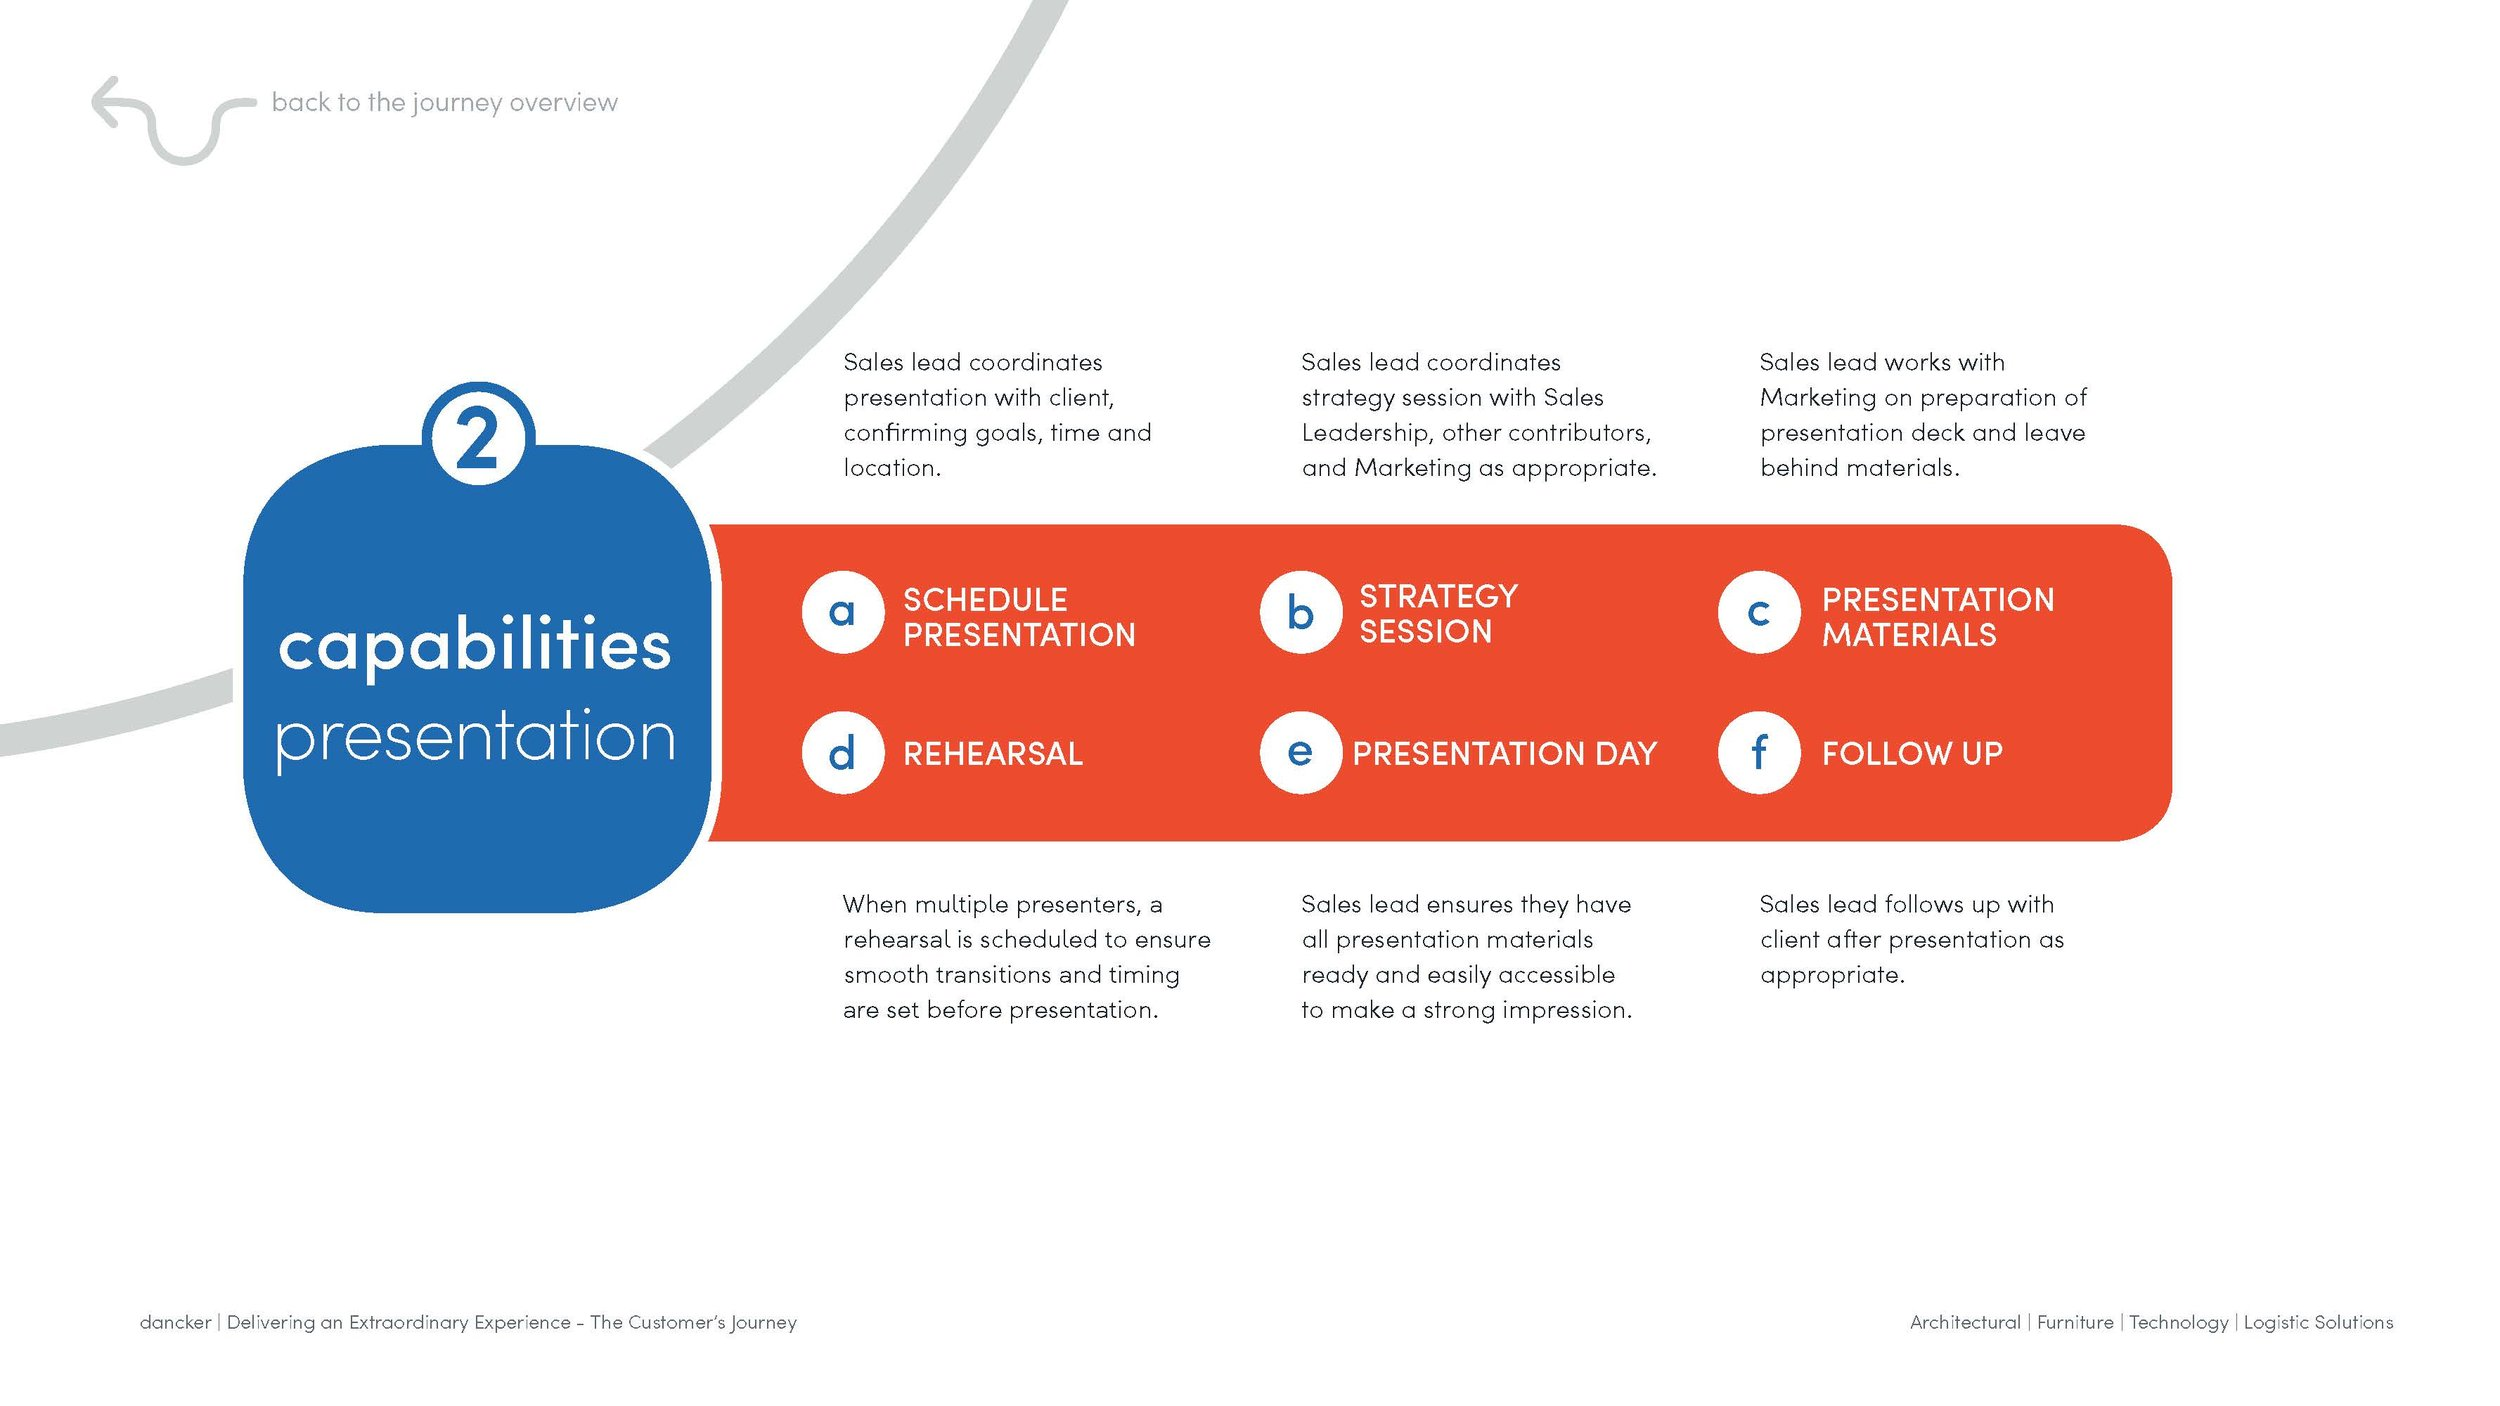 dancker_Customer Journey_Interactive Process_draft 3_Page_06.jpg